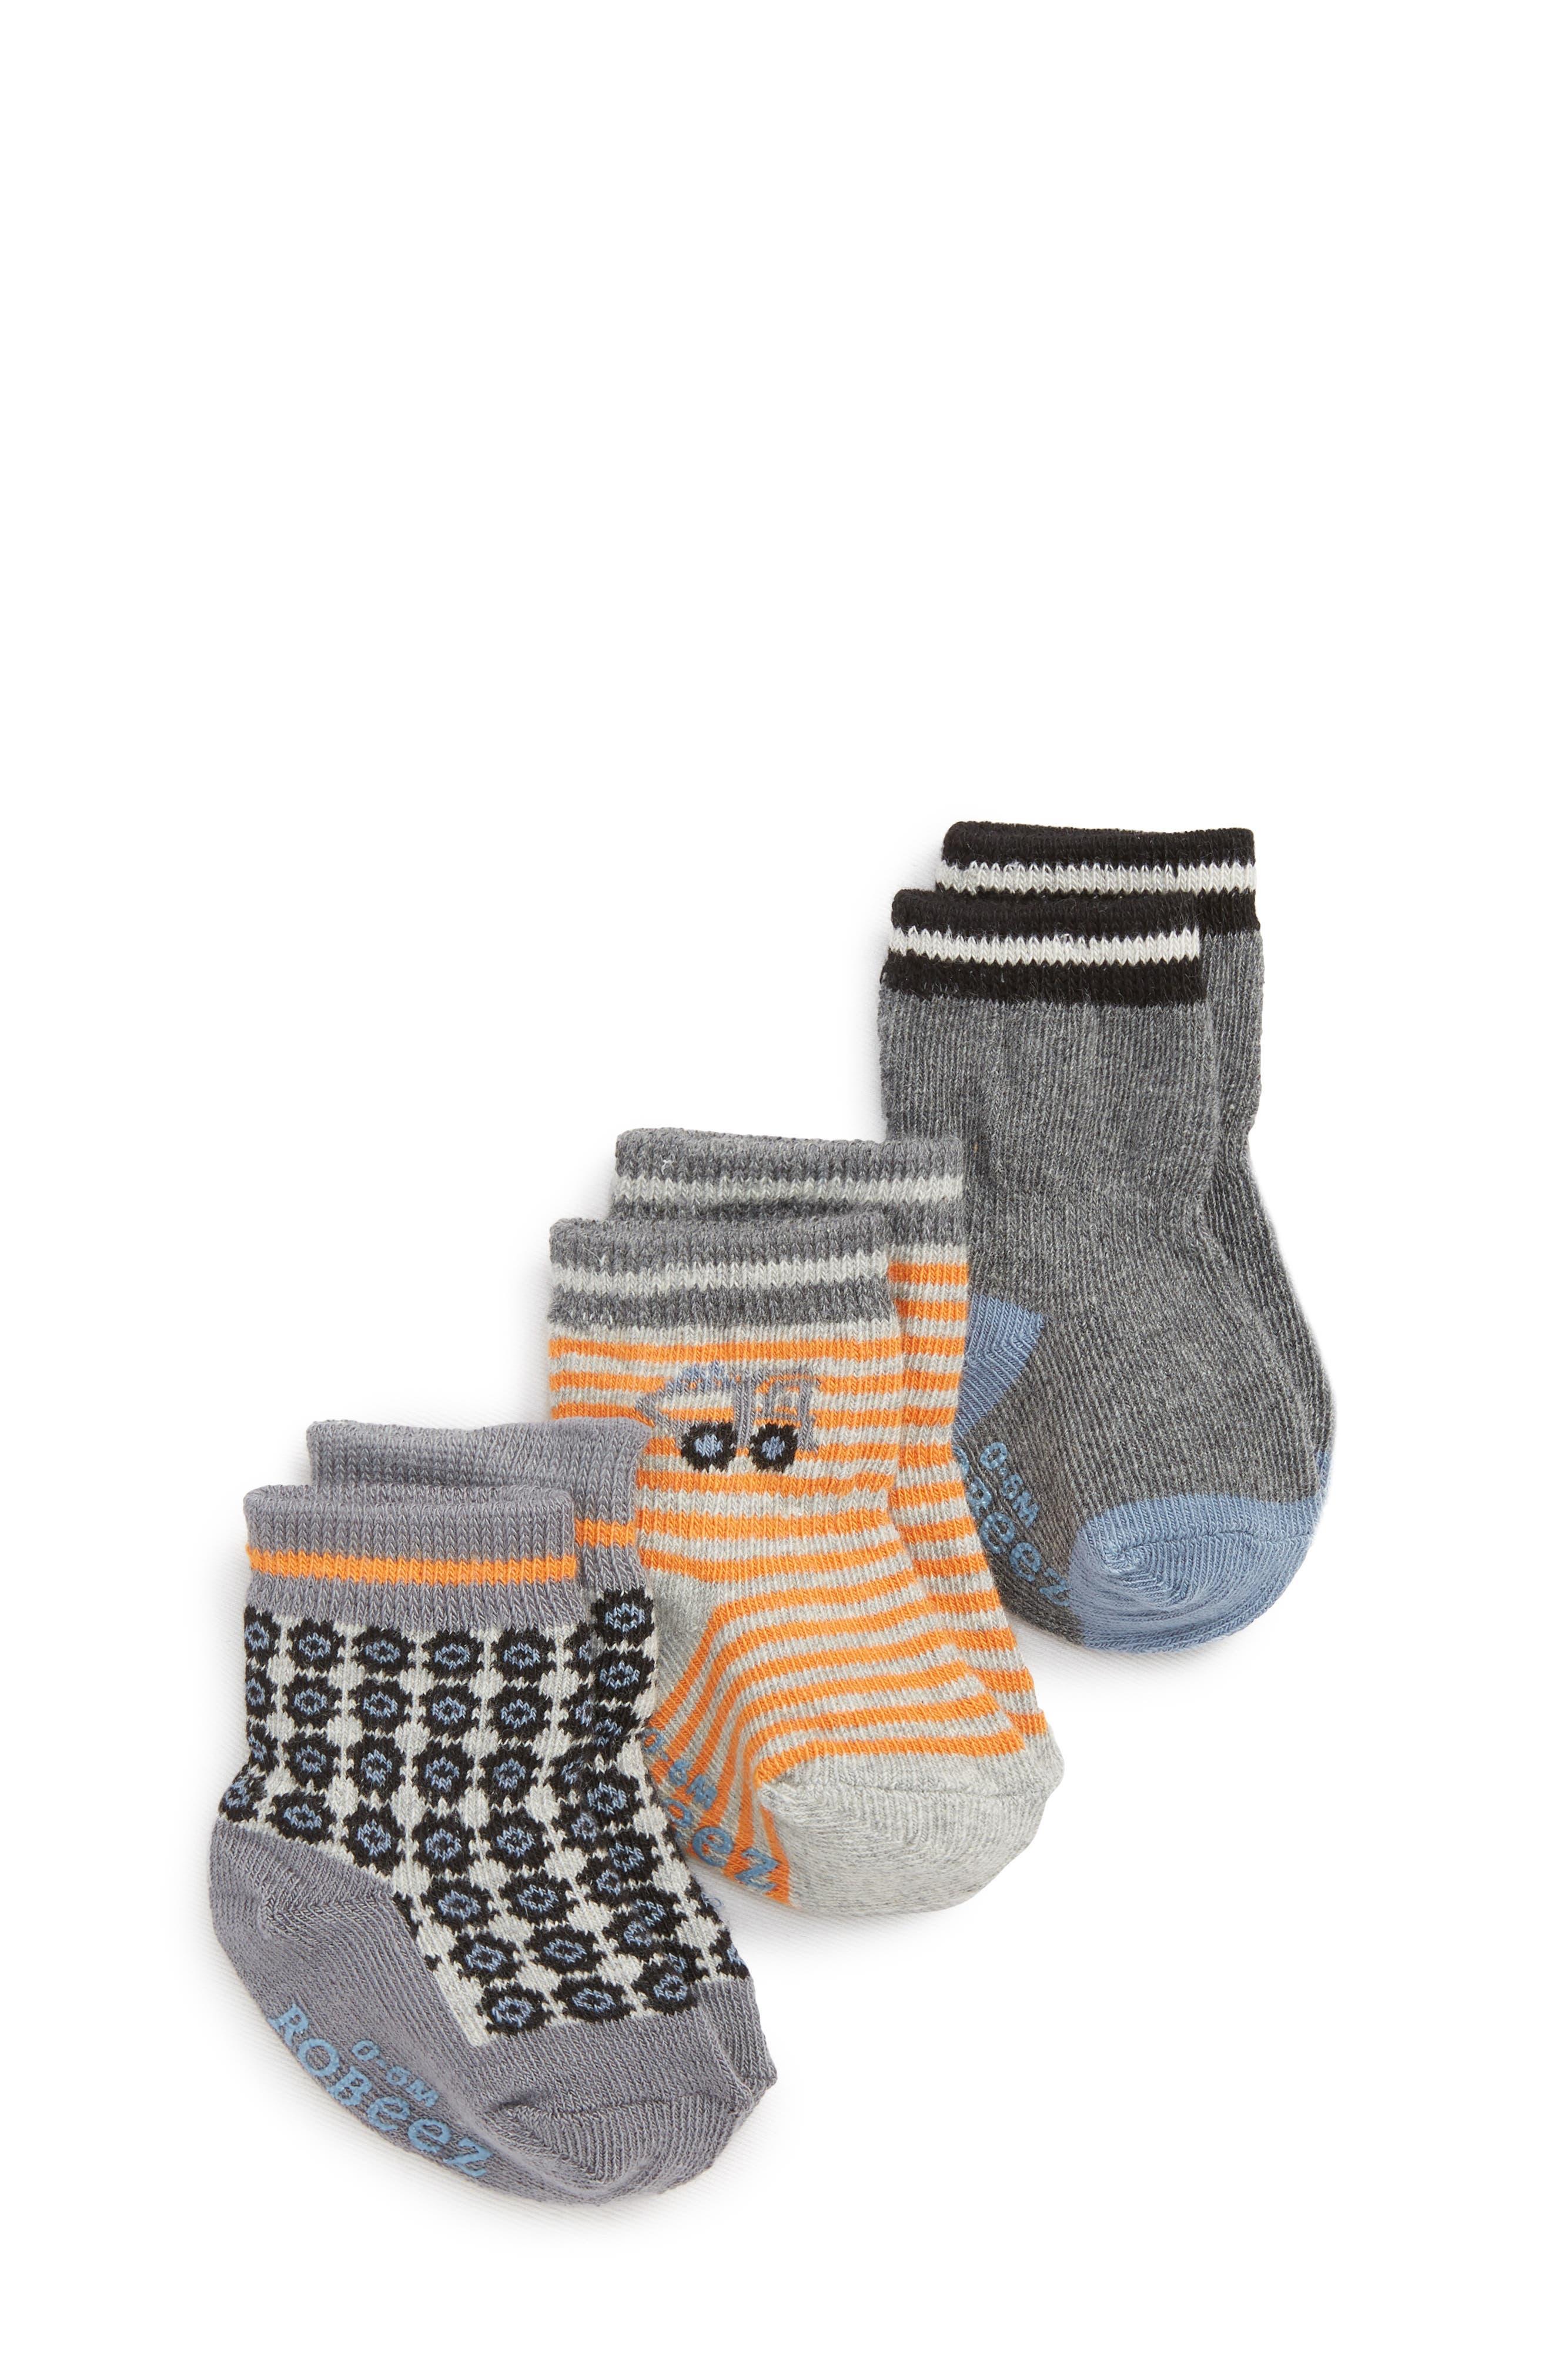 Gravel & Gears 3-Pack Socks,                         Main,                         color, GREY/ ORANGE/ BLUE